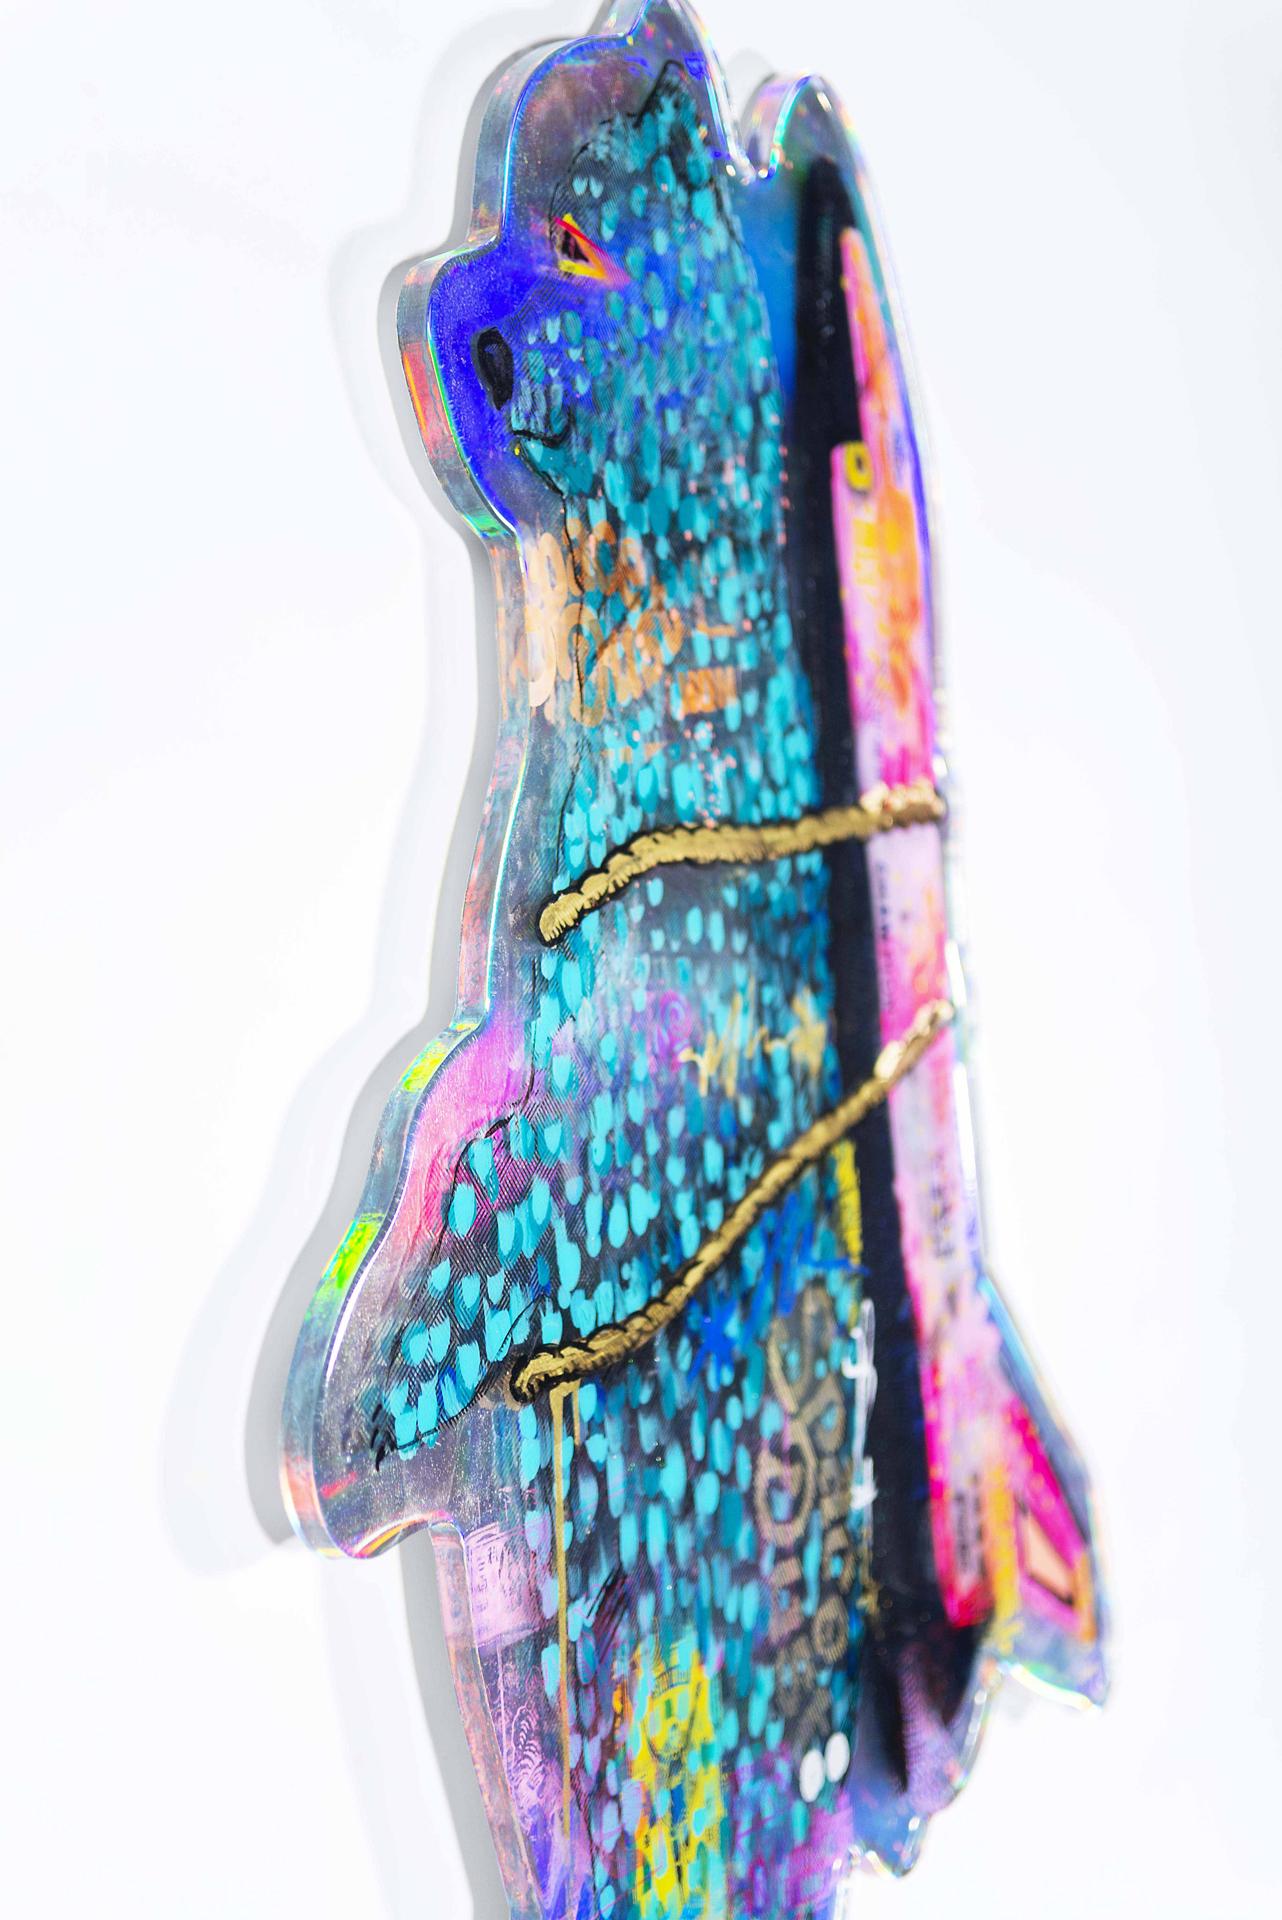 LittleBearDetails01.jpg